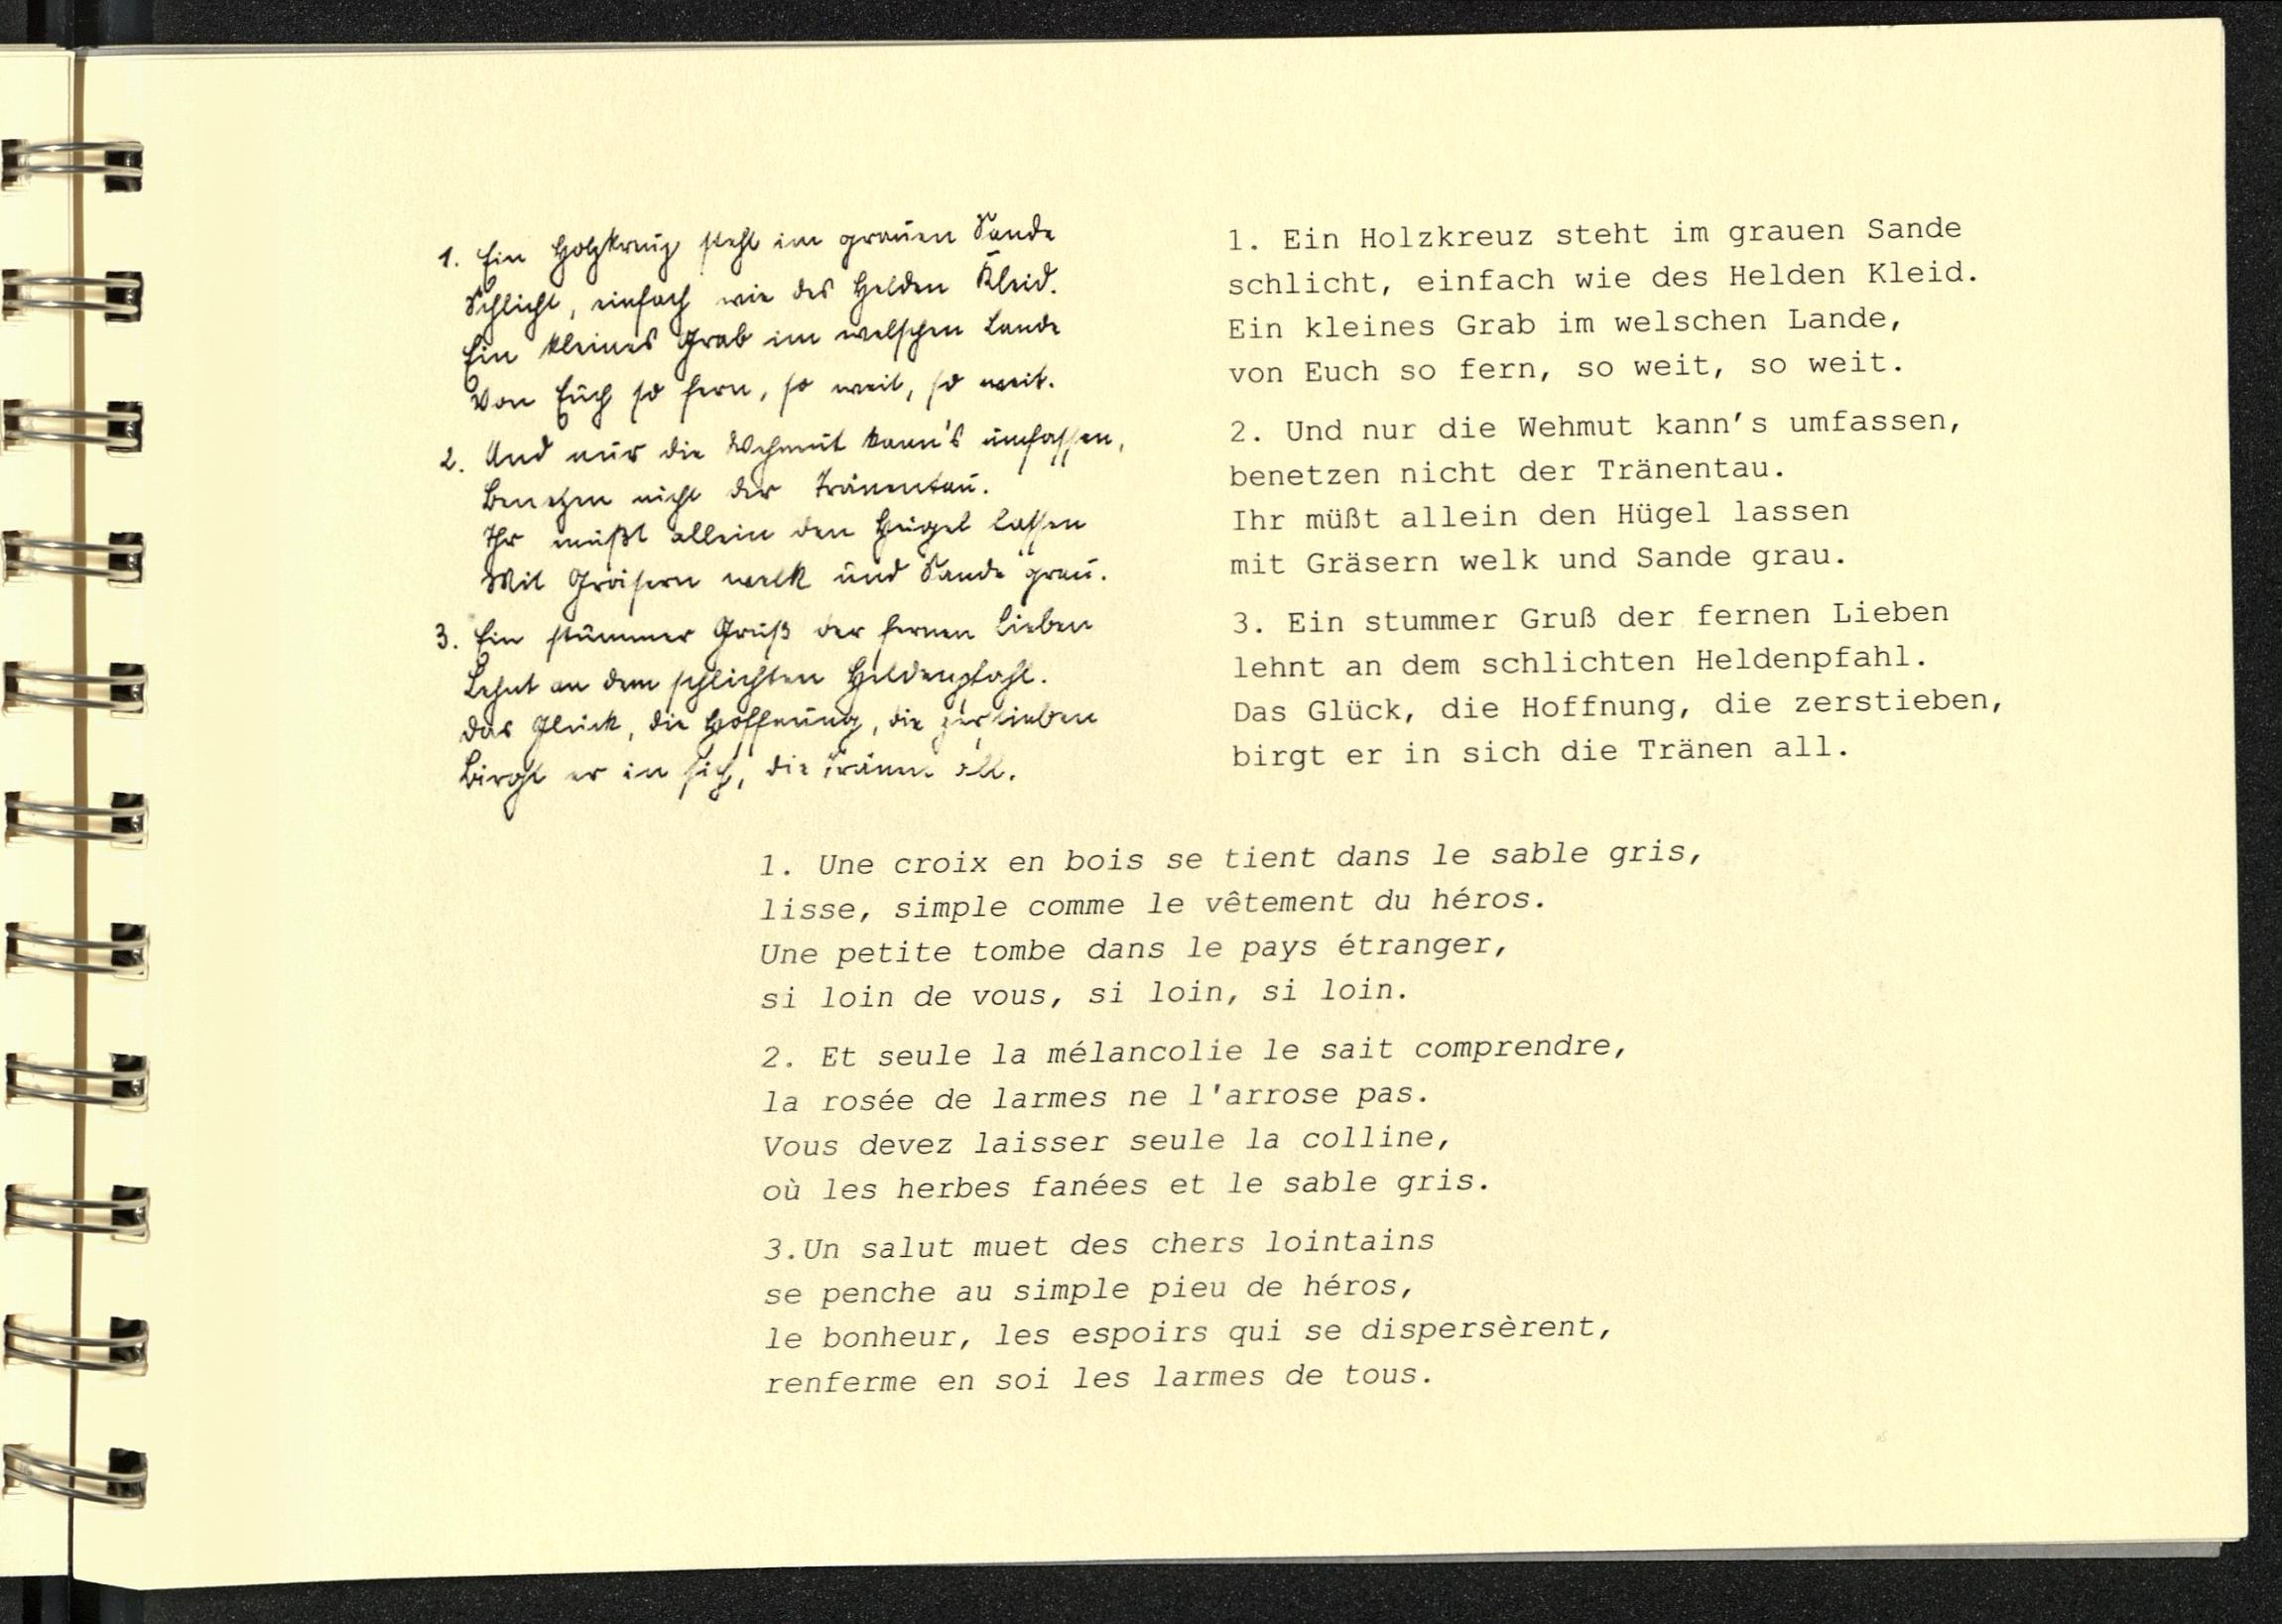 Gedichte Des Leutnants Der Reserve Franz Berens Item 53